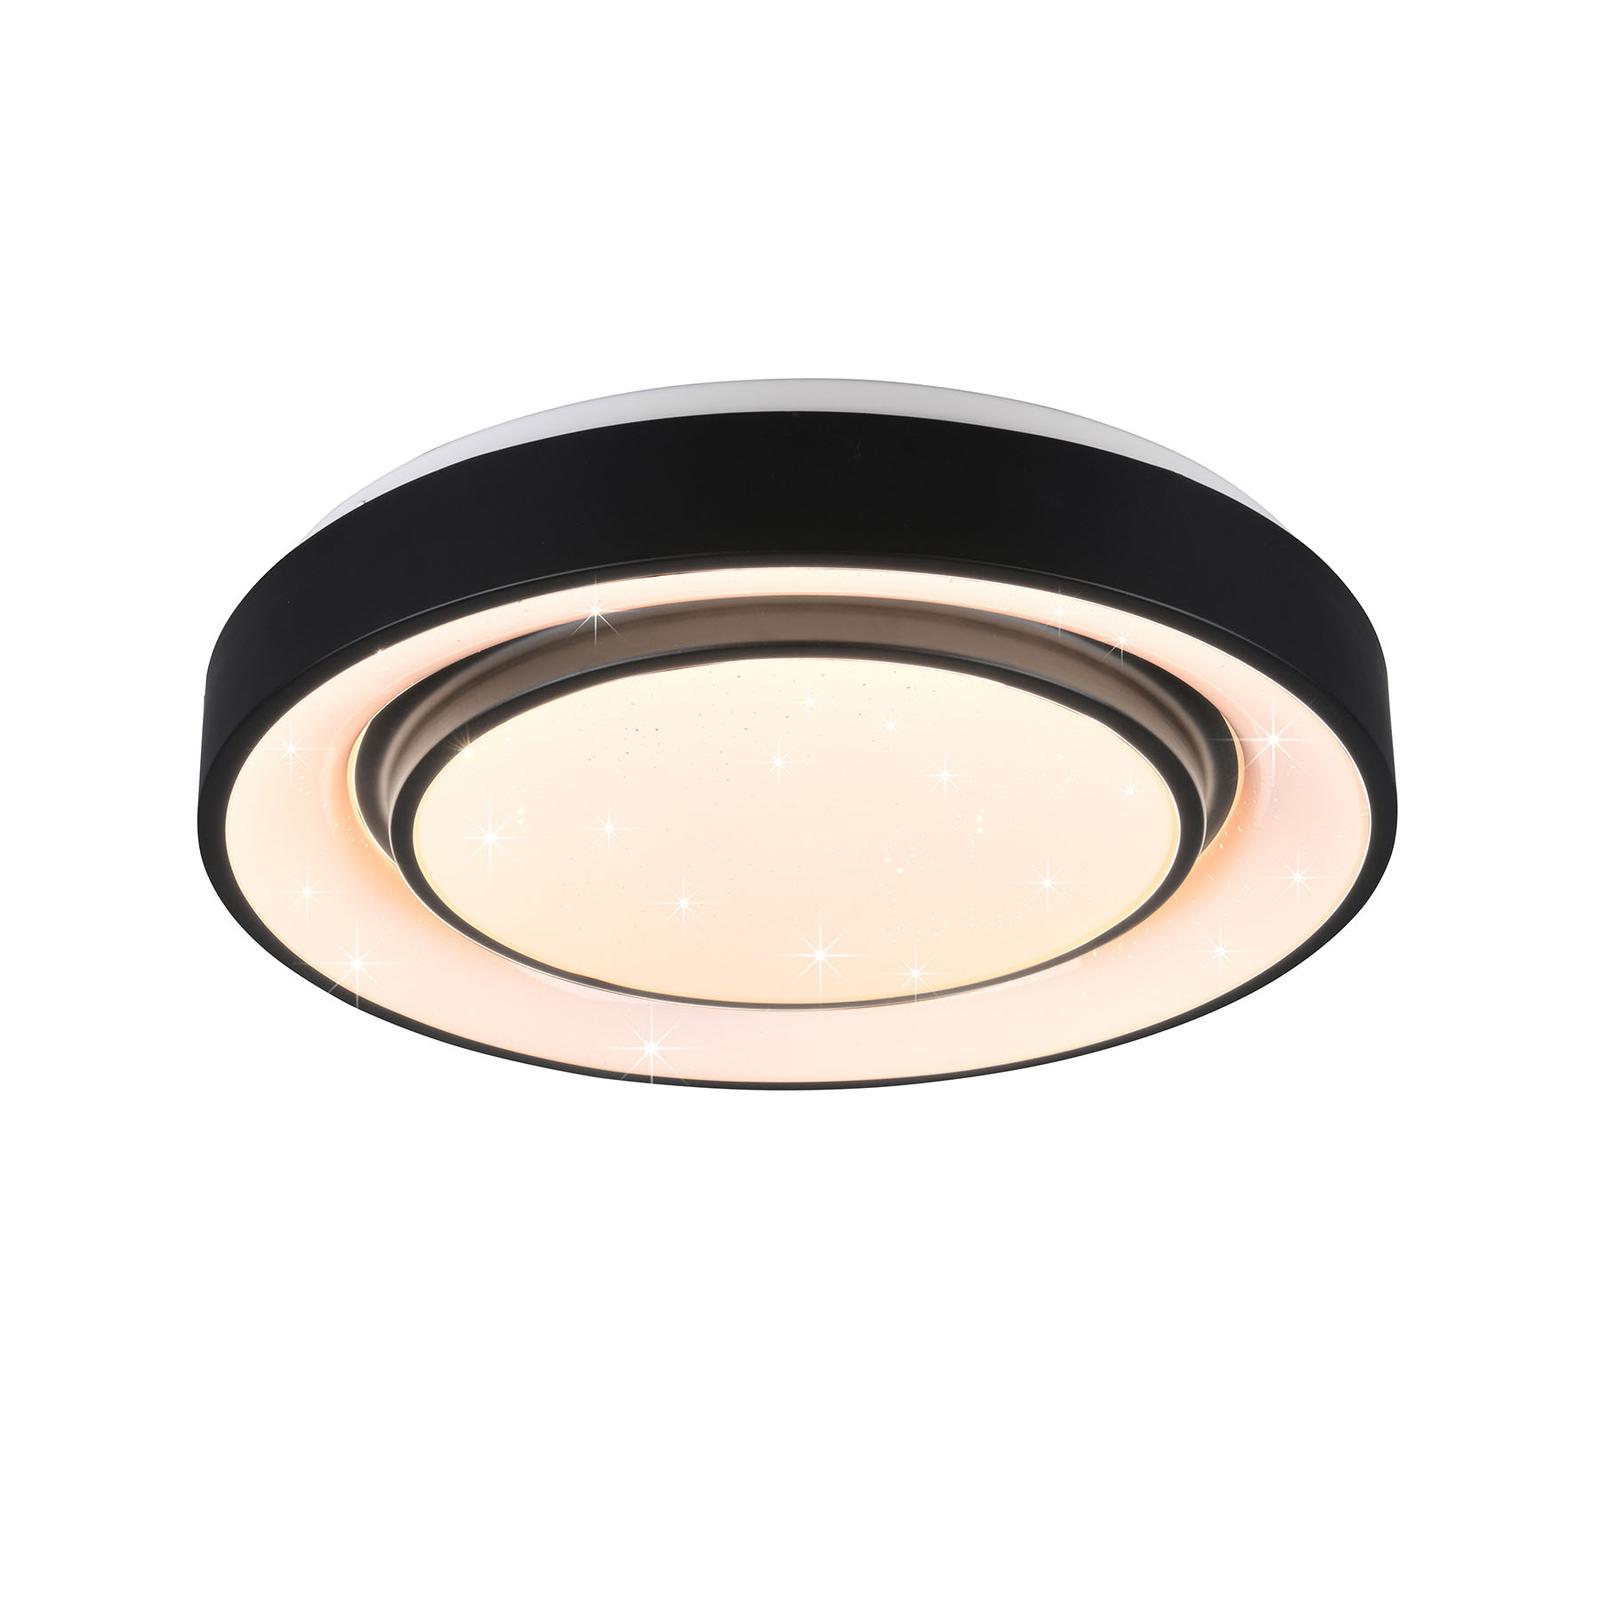 LED plafondlamp Mona, WiZ, RGBW, dimbaar